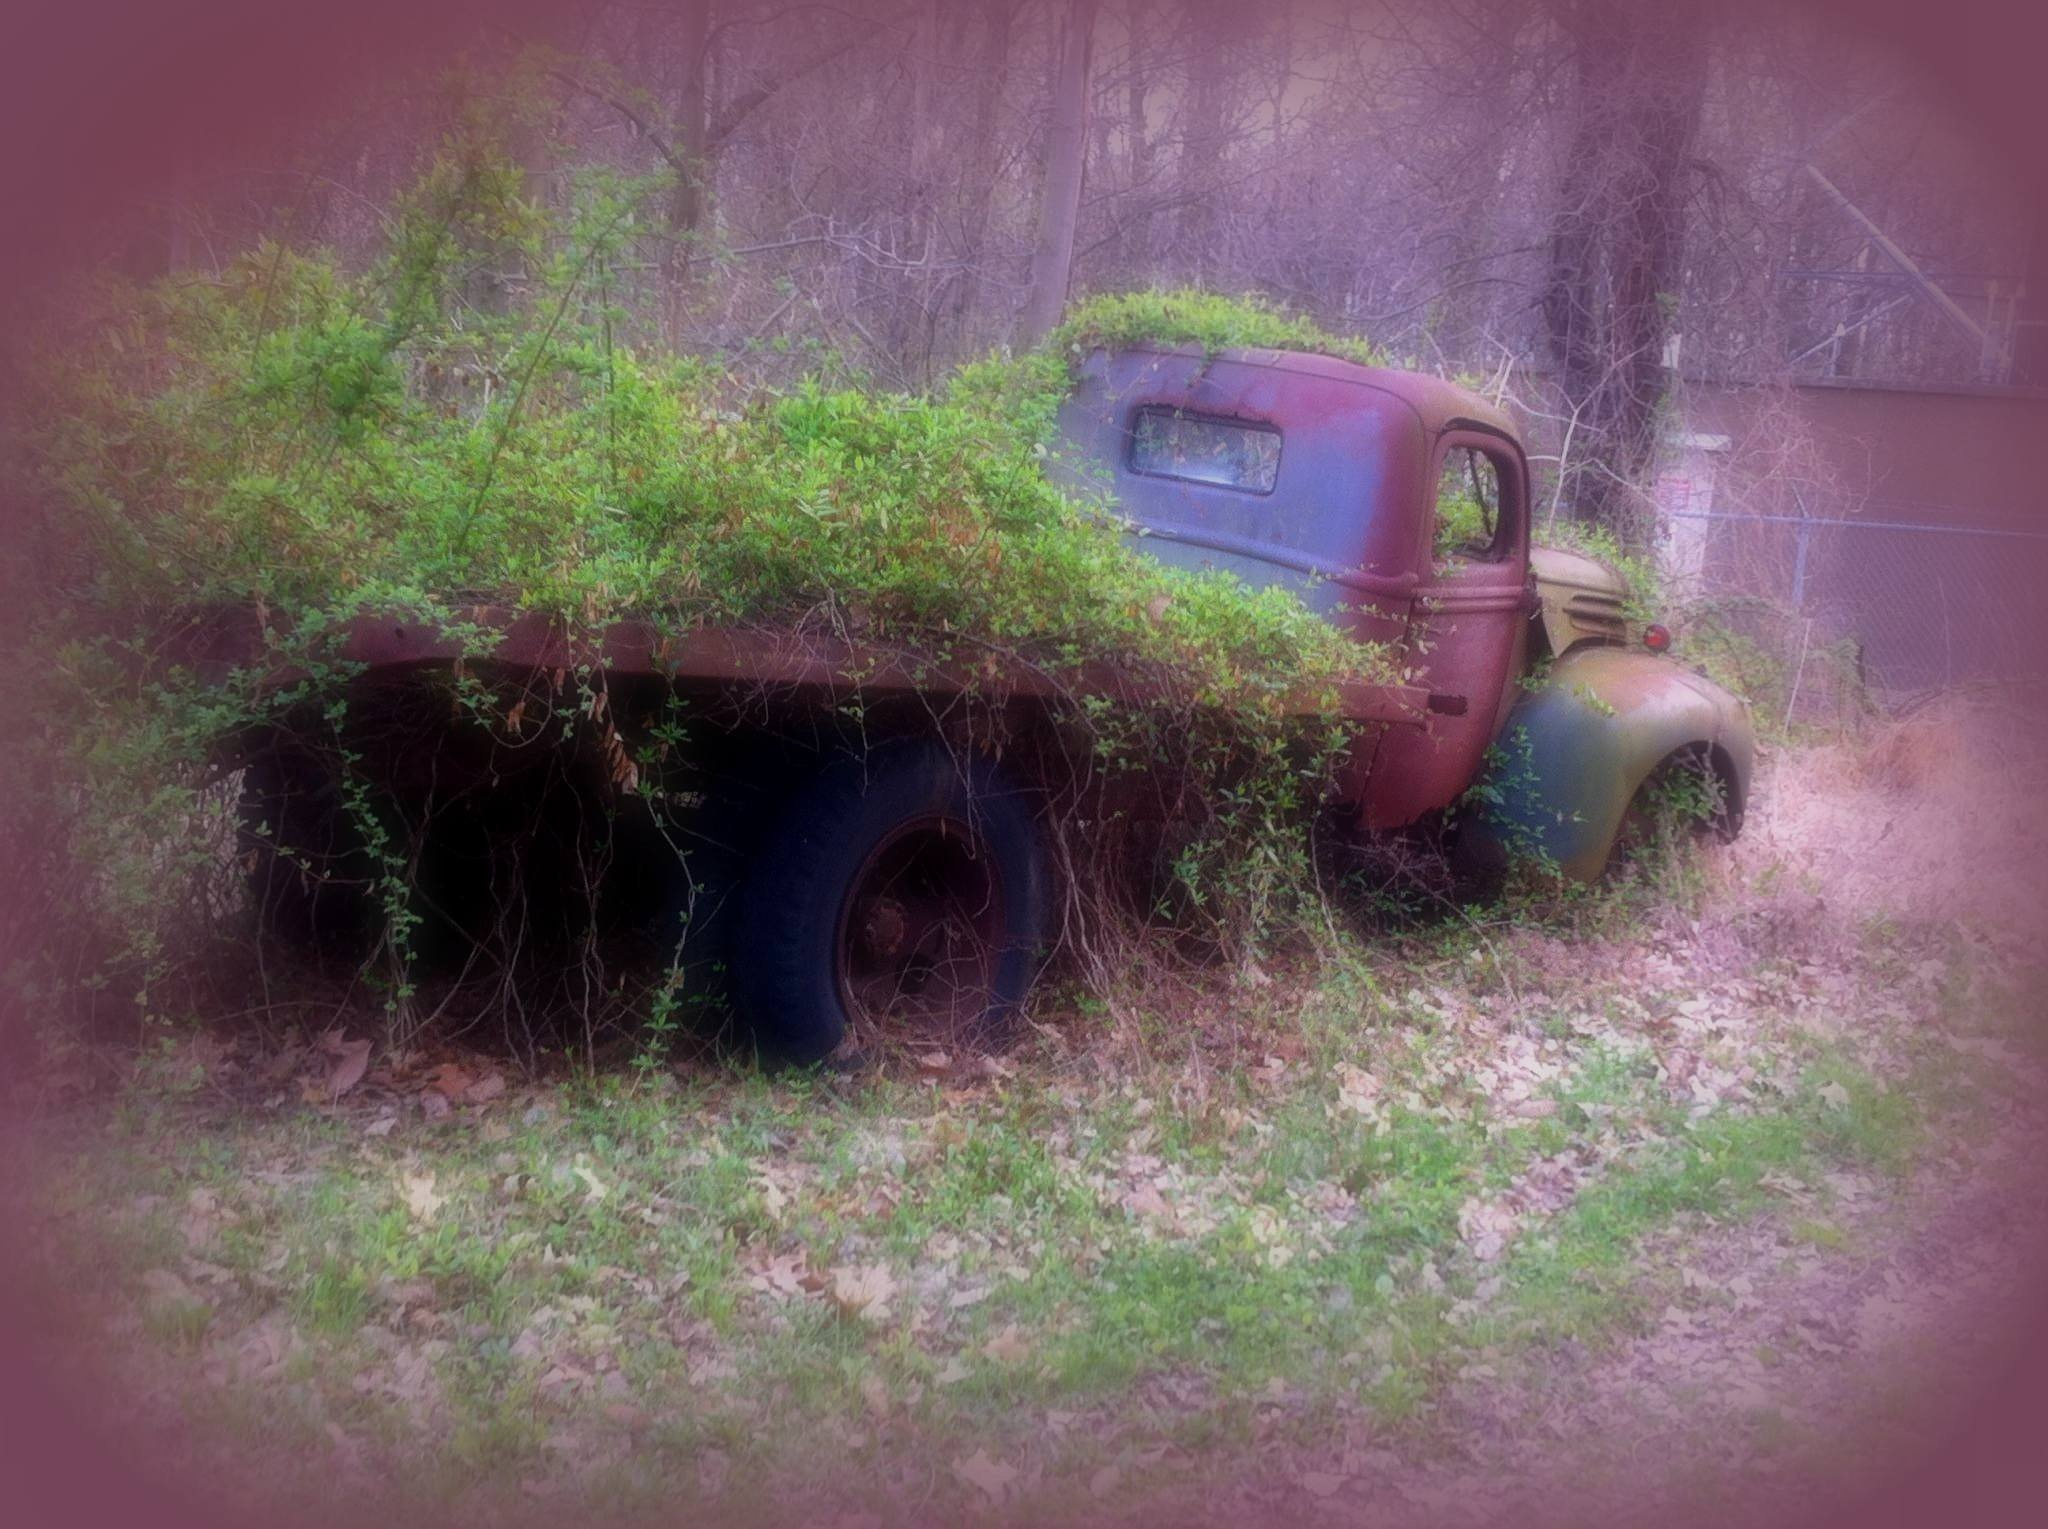 Pop's Truck by Wendy Reinhart-Miller